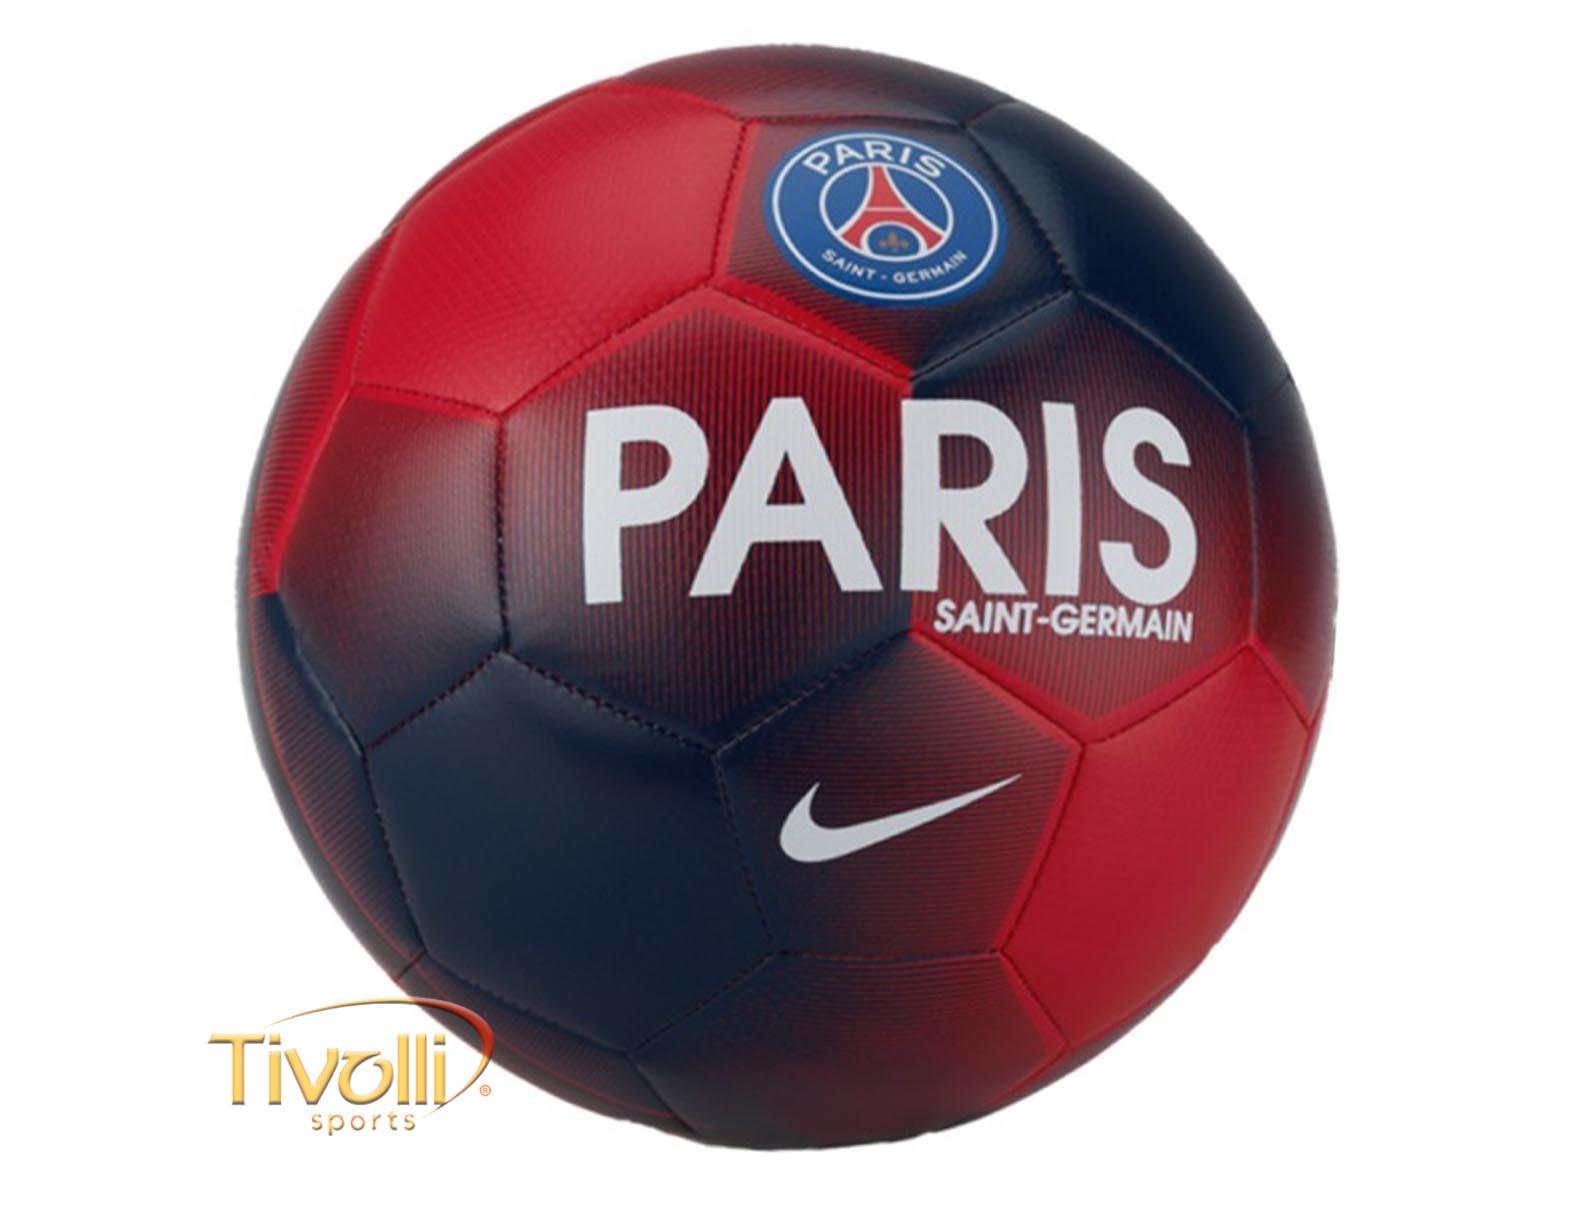 1b2f8eed9e Bola Nike Paris Saint-Germain Prestige Campo   Vermelha